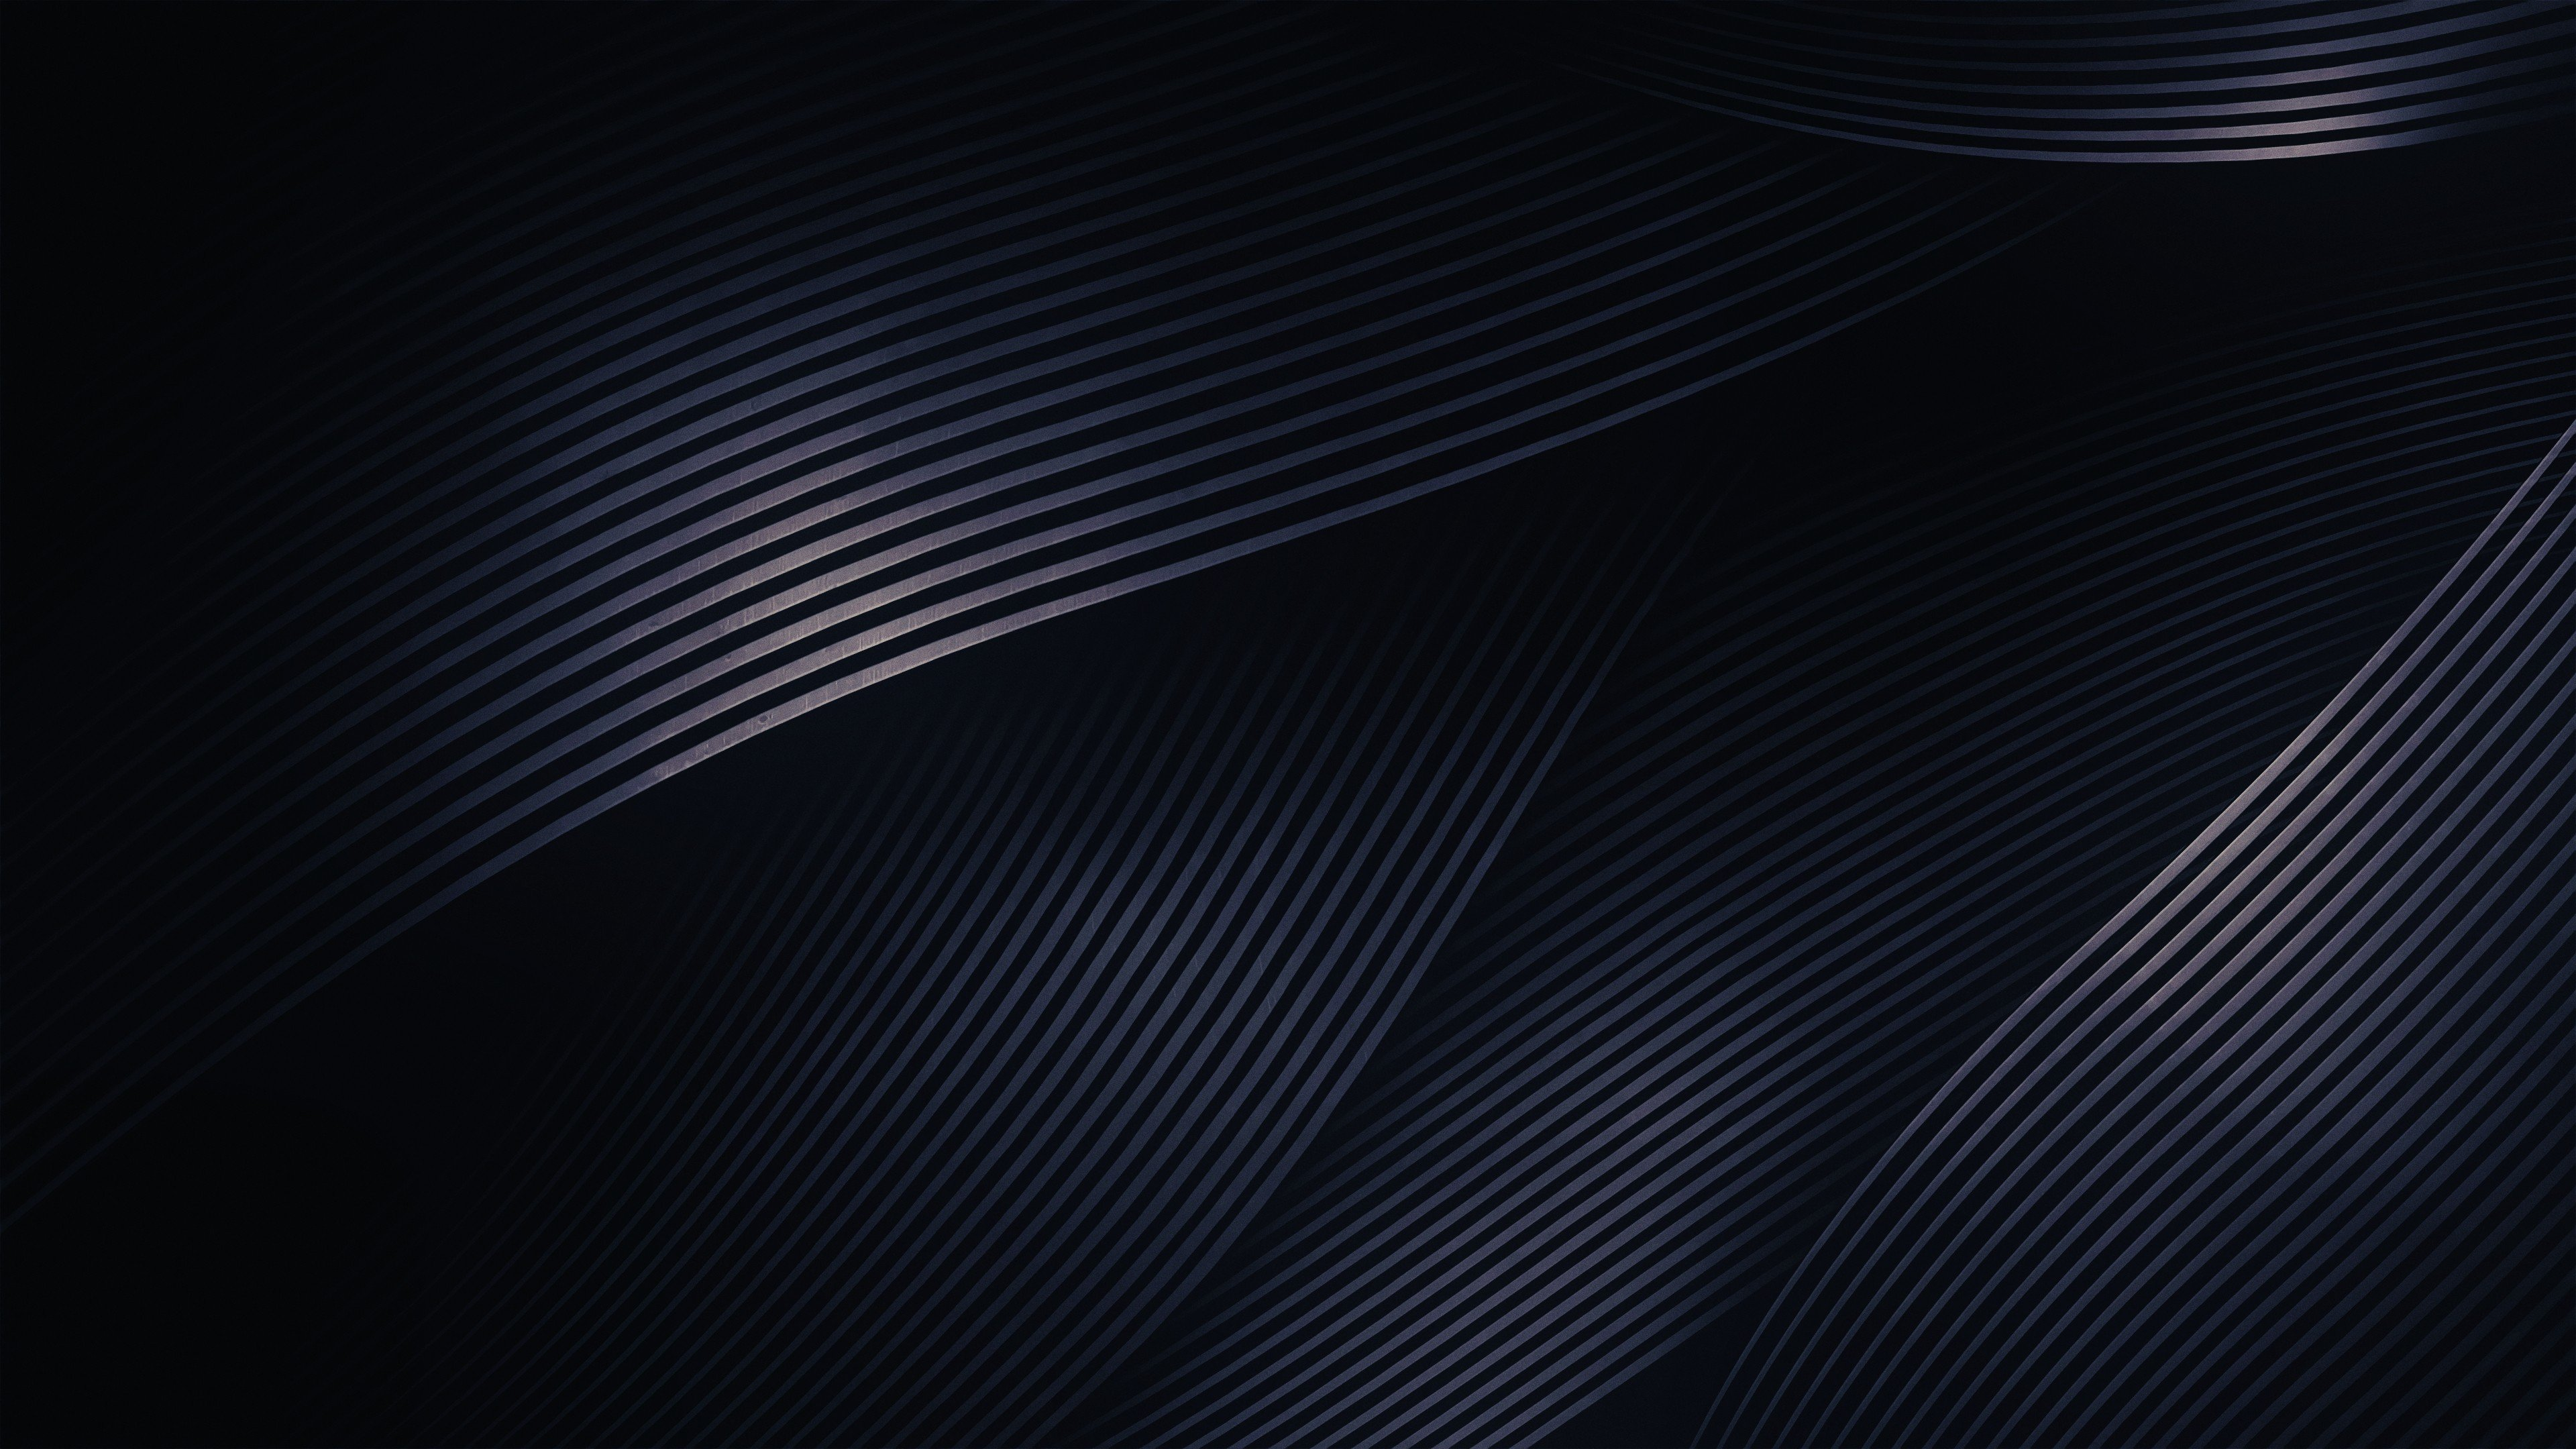 Dark Waves Wallpapers Wallpaper Cave